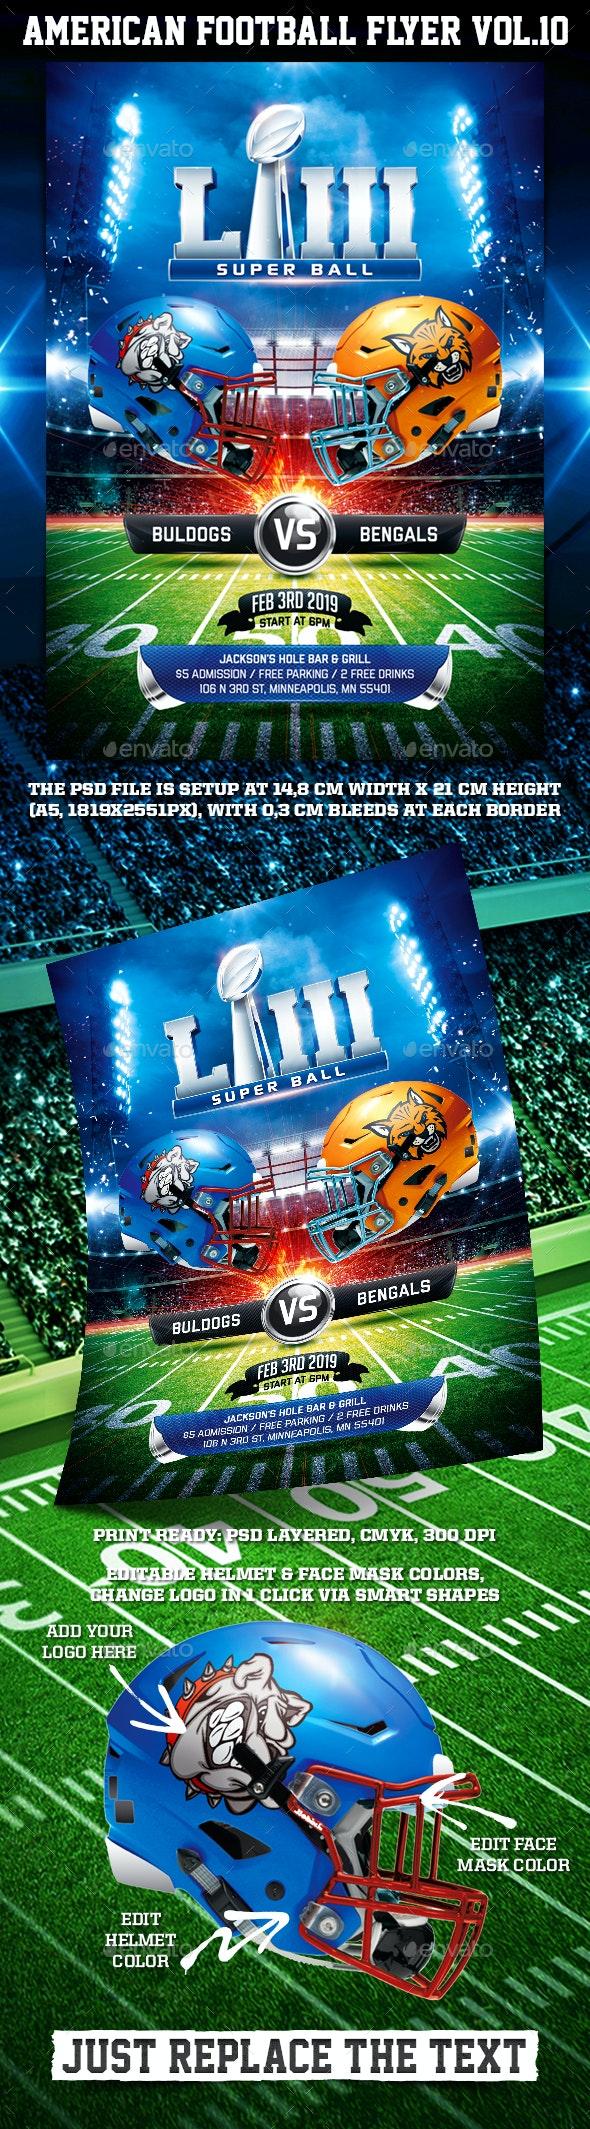 American Football Super Ball Flyer vol.11 - Sports Events